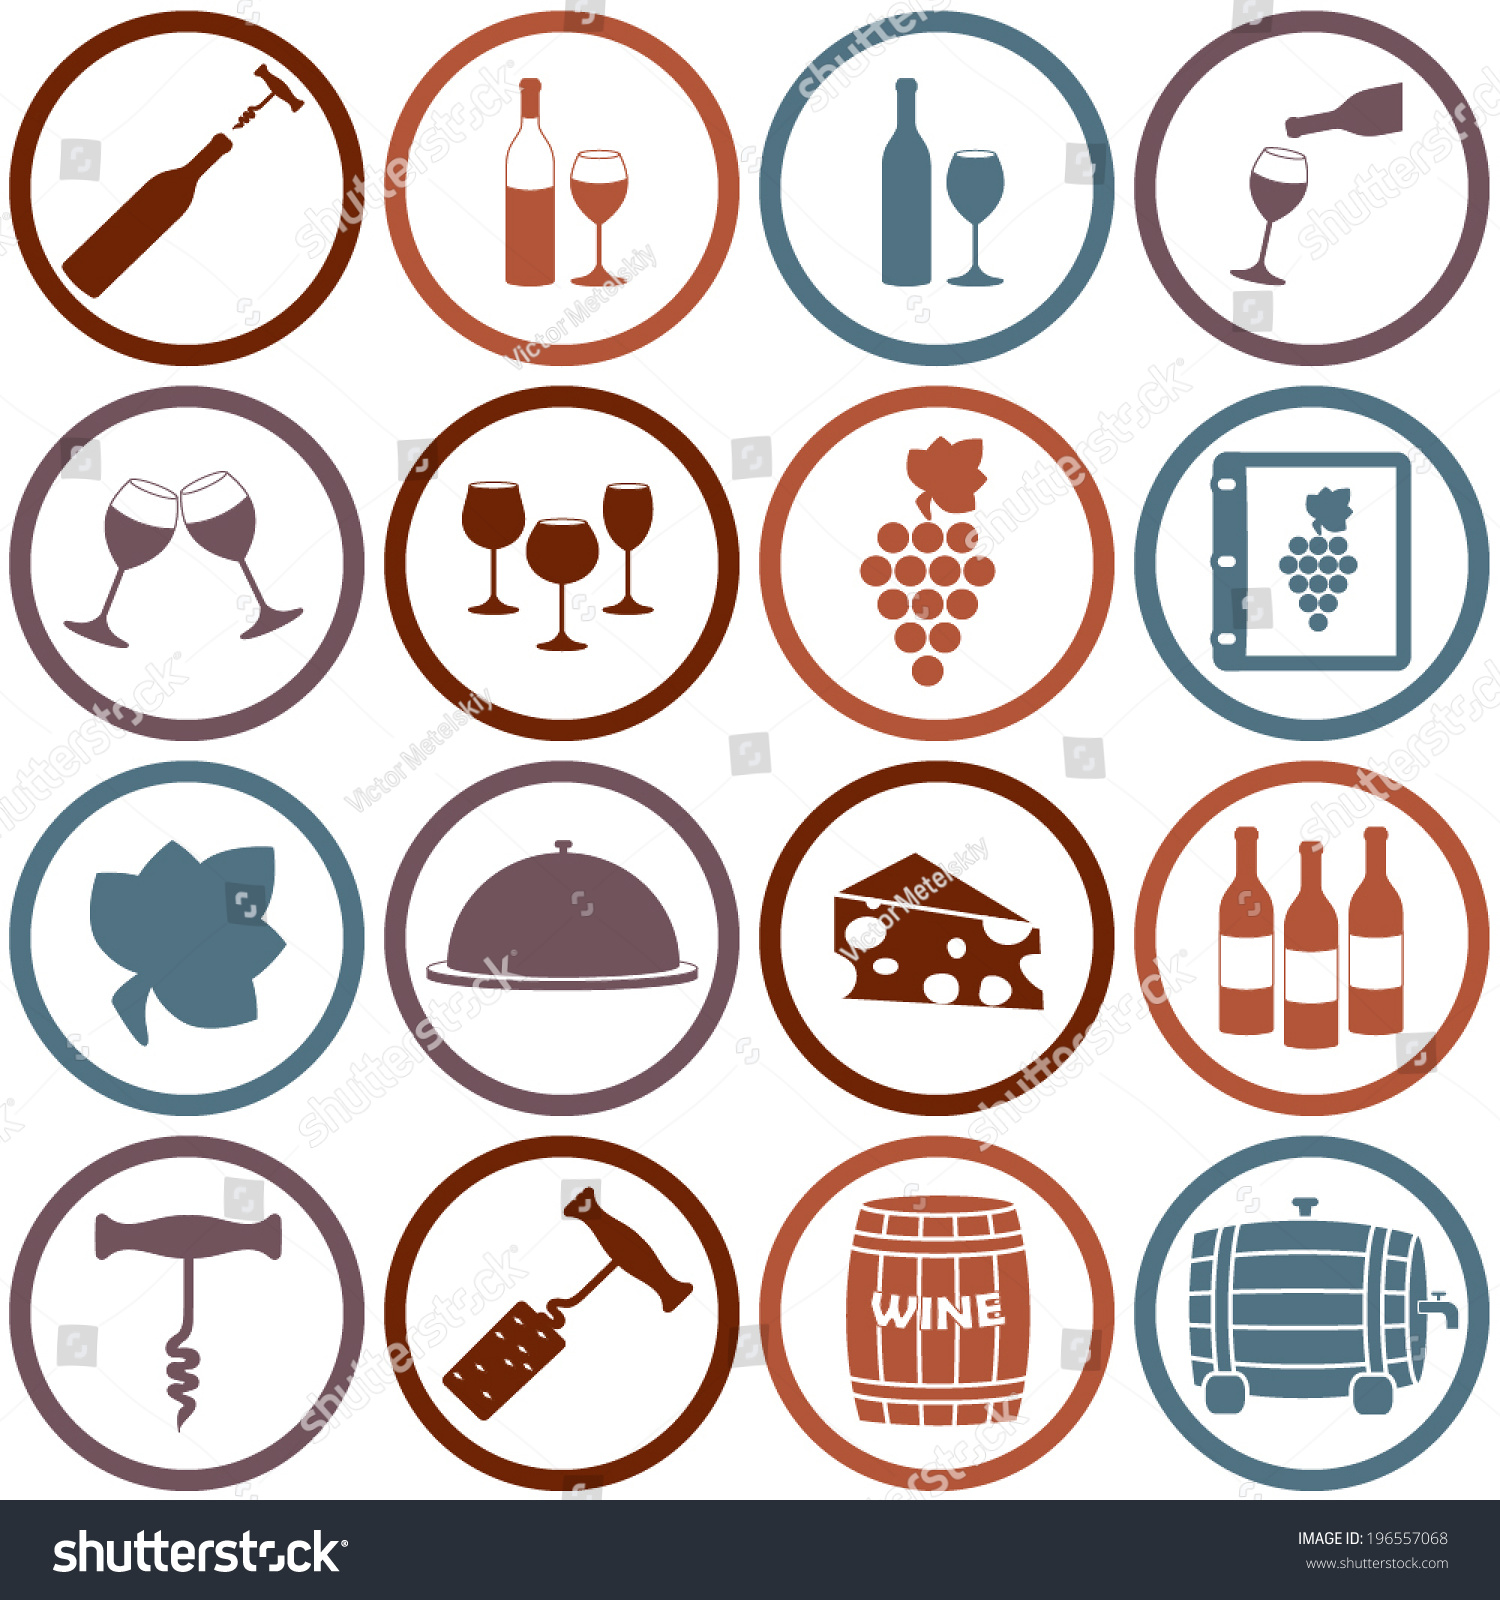 Wine icons set design restaurant food stock vector